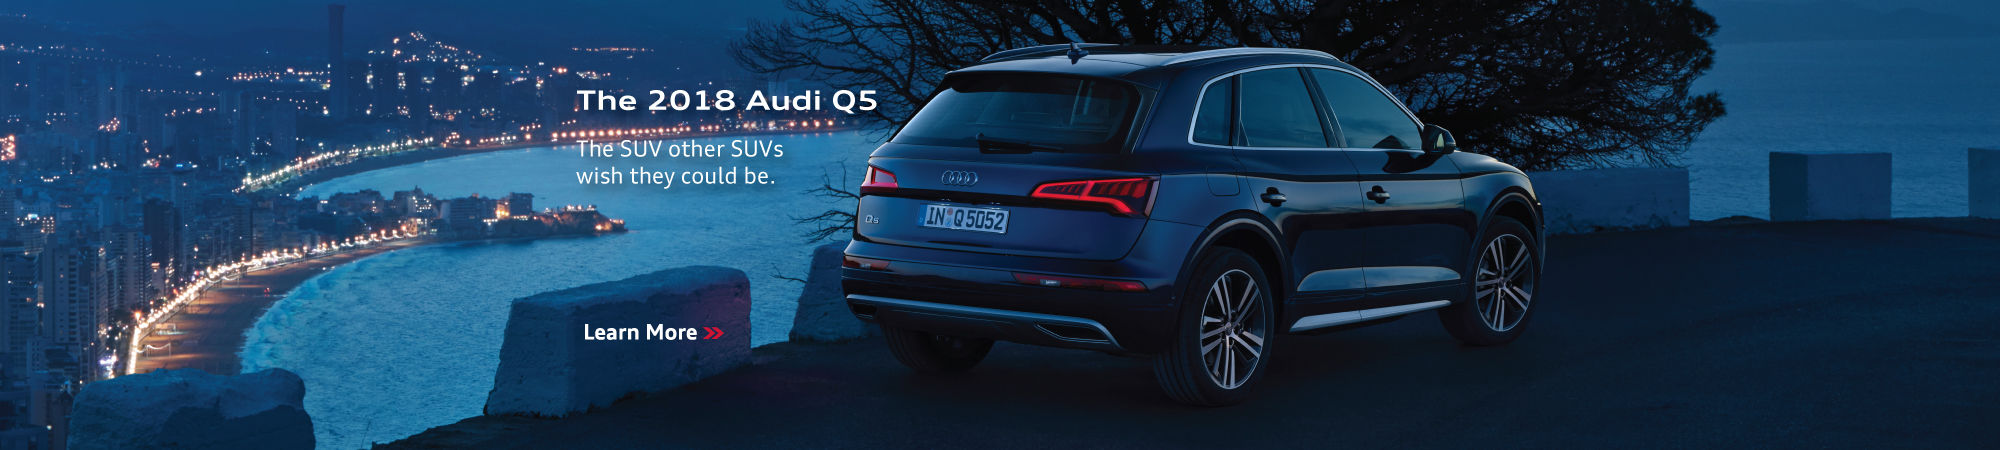 The 2018 Audi Q5